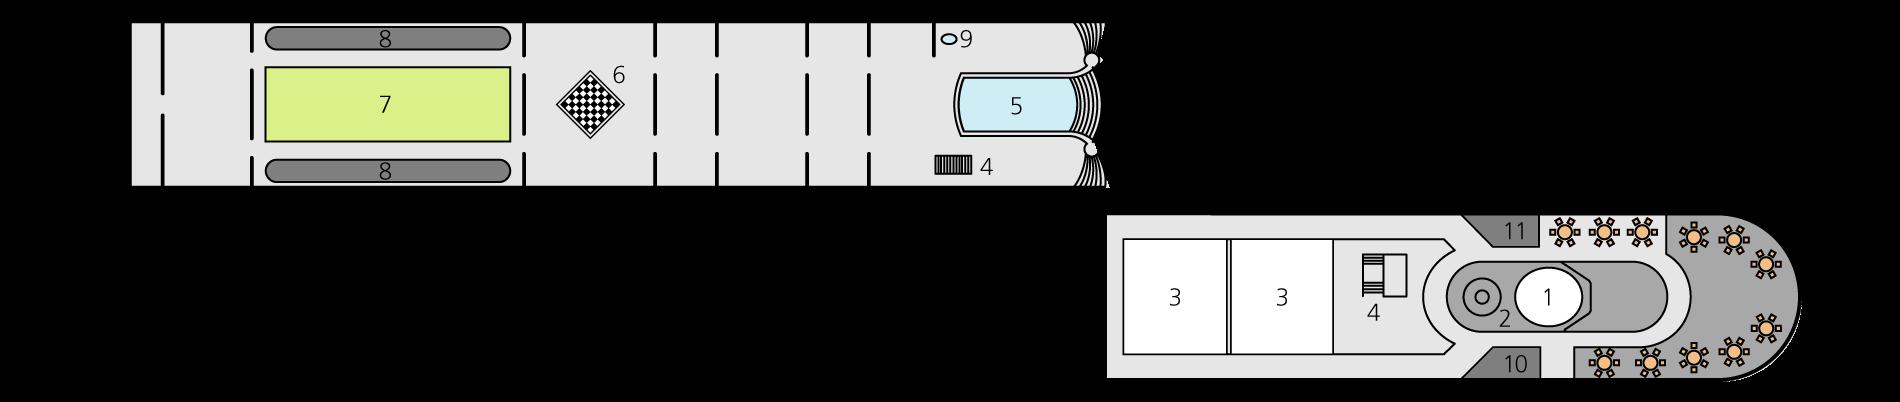 A-ROSA STELLA Deck 4